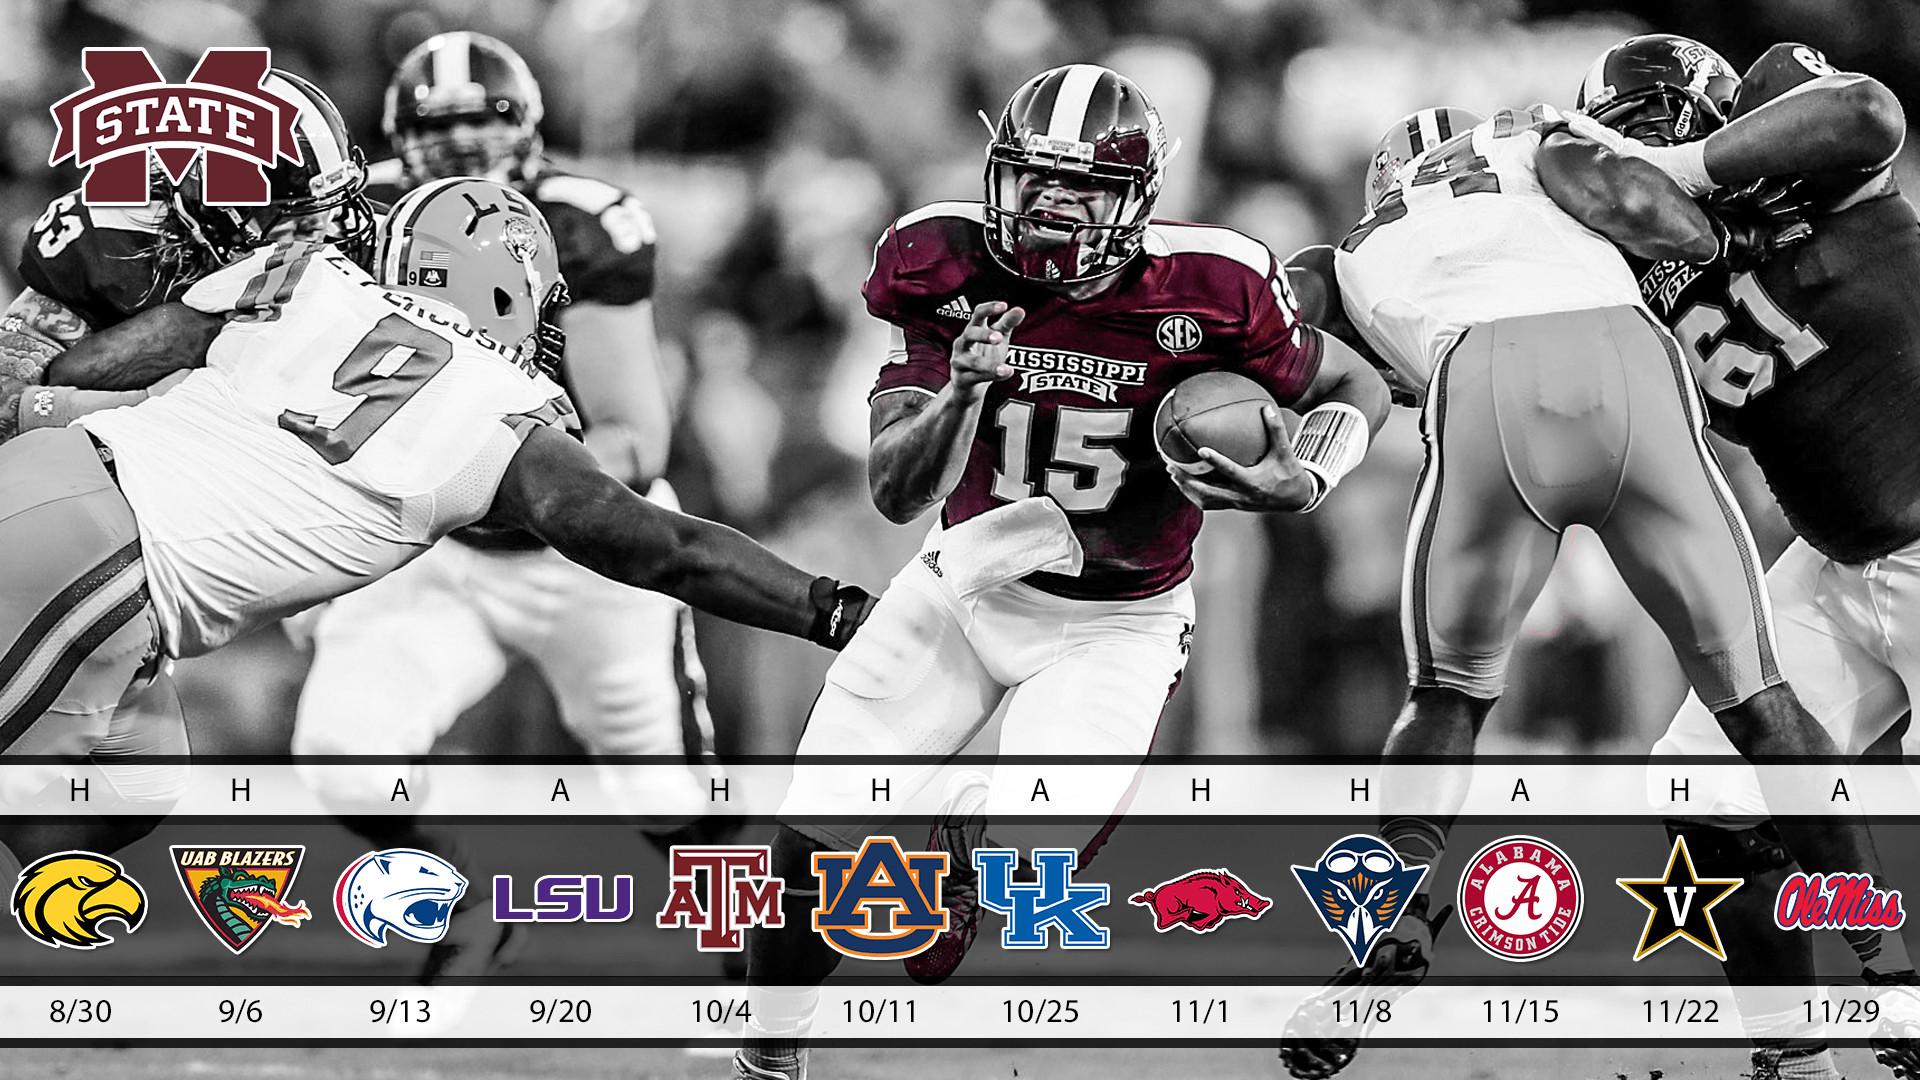 Mississippi State Football Wallpapers – WallpaperSafari